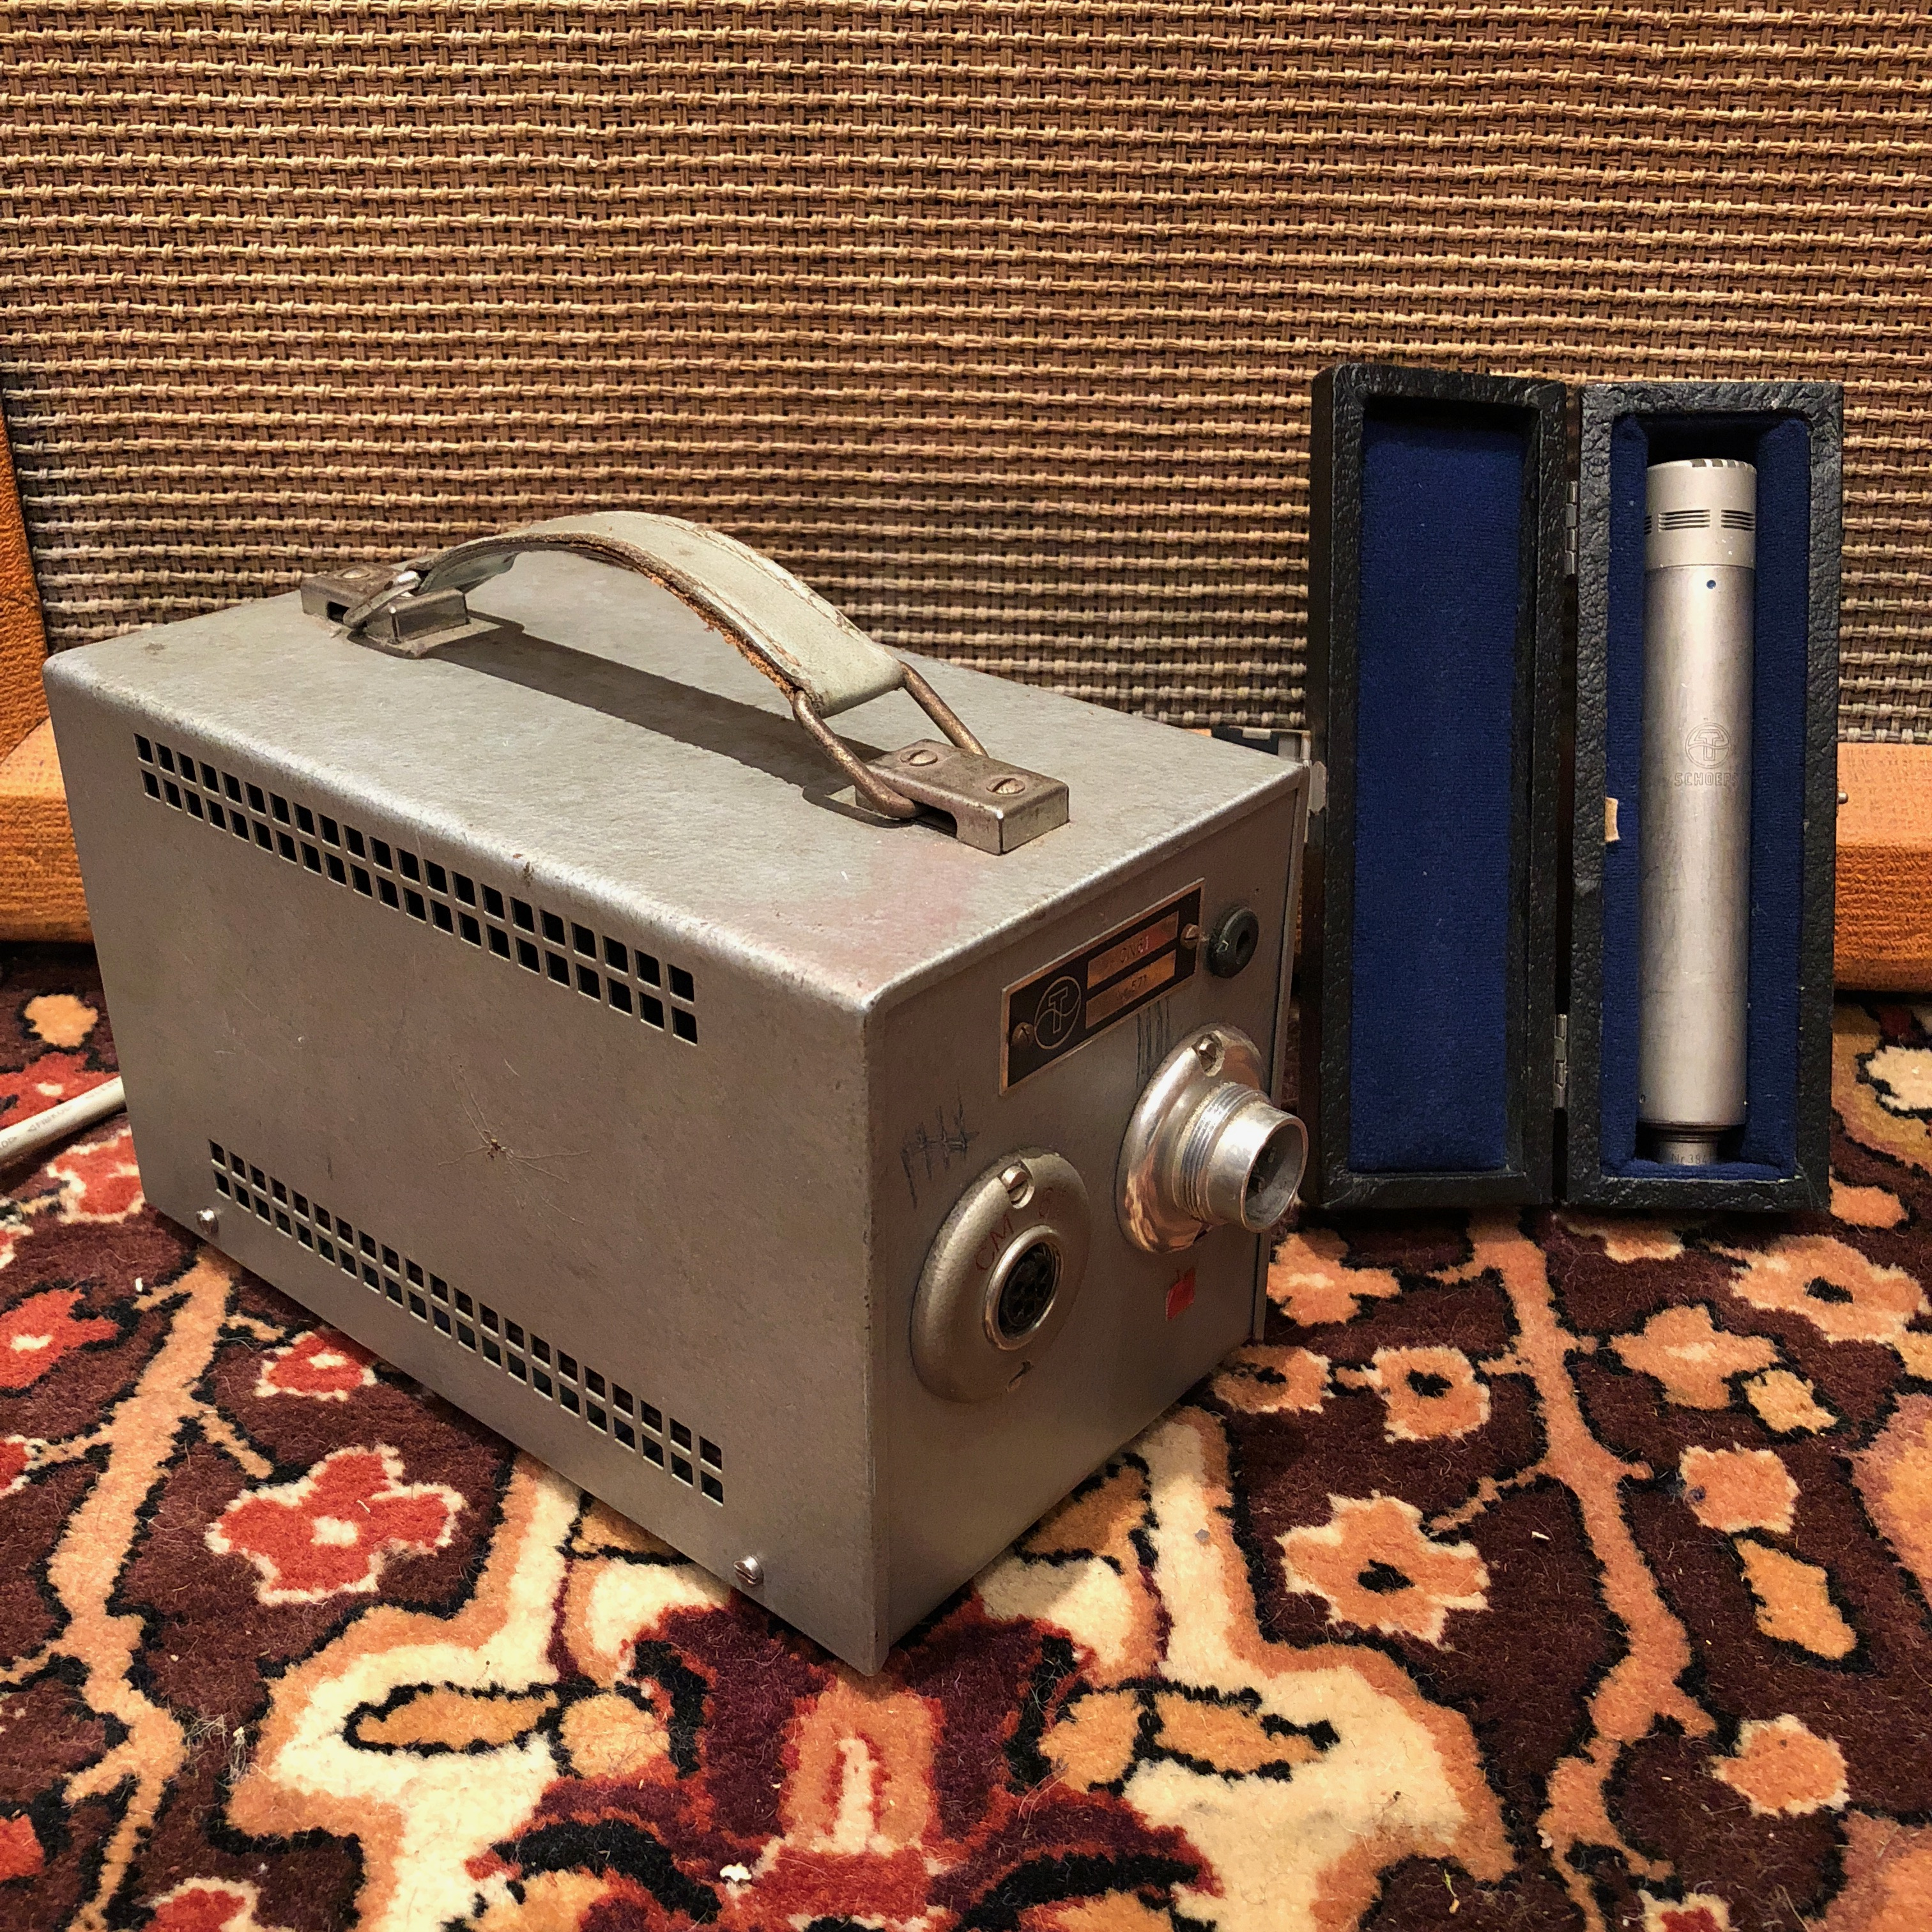 Vintage Schoeps CM640 Valve Cardioid Condenser Microphone CN61 Cables